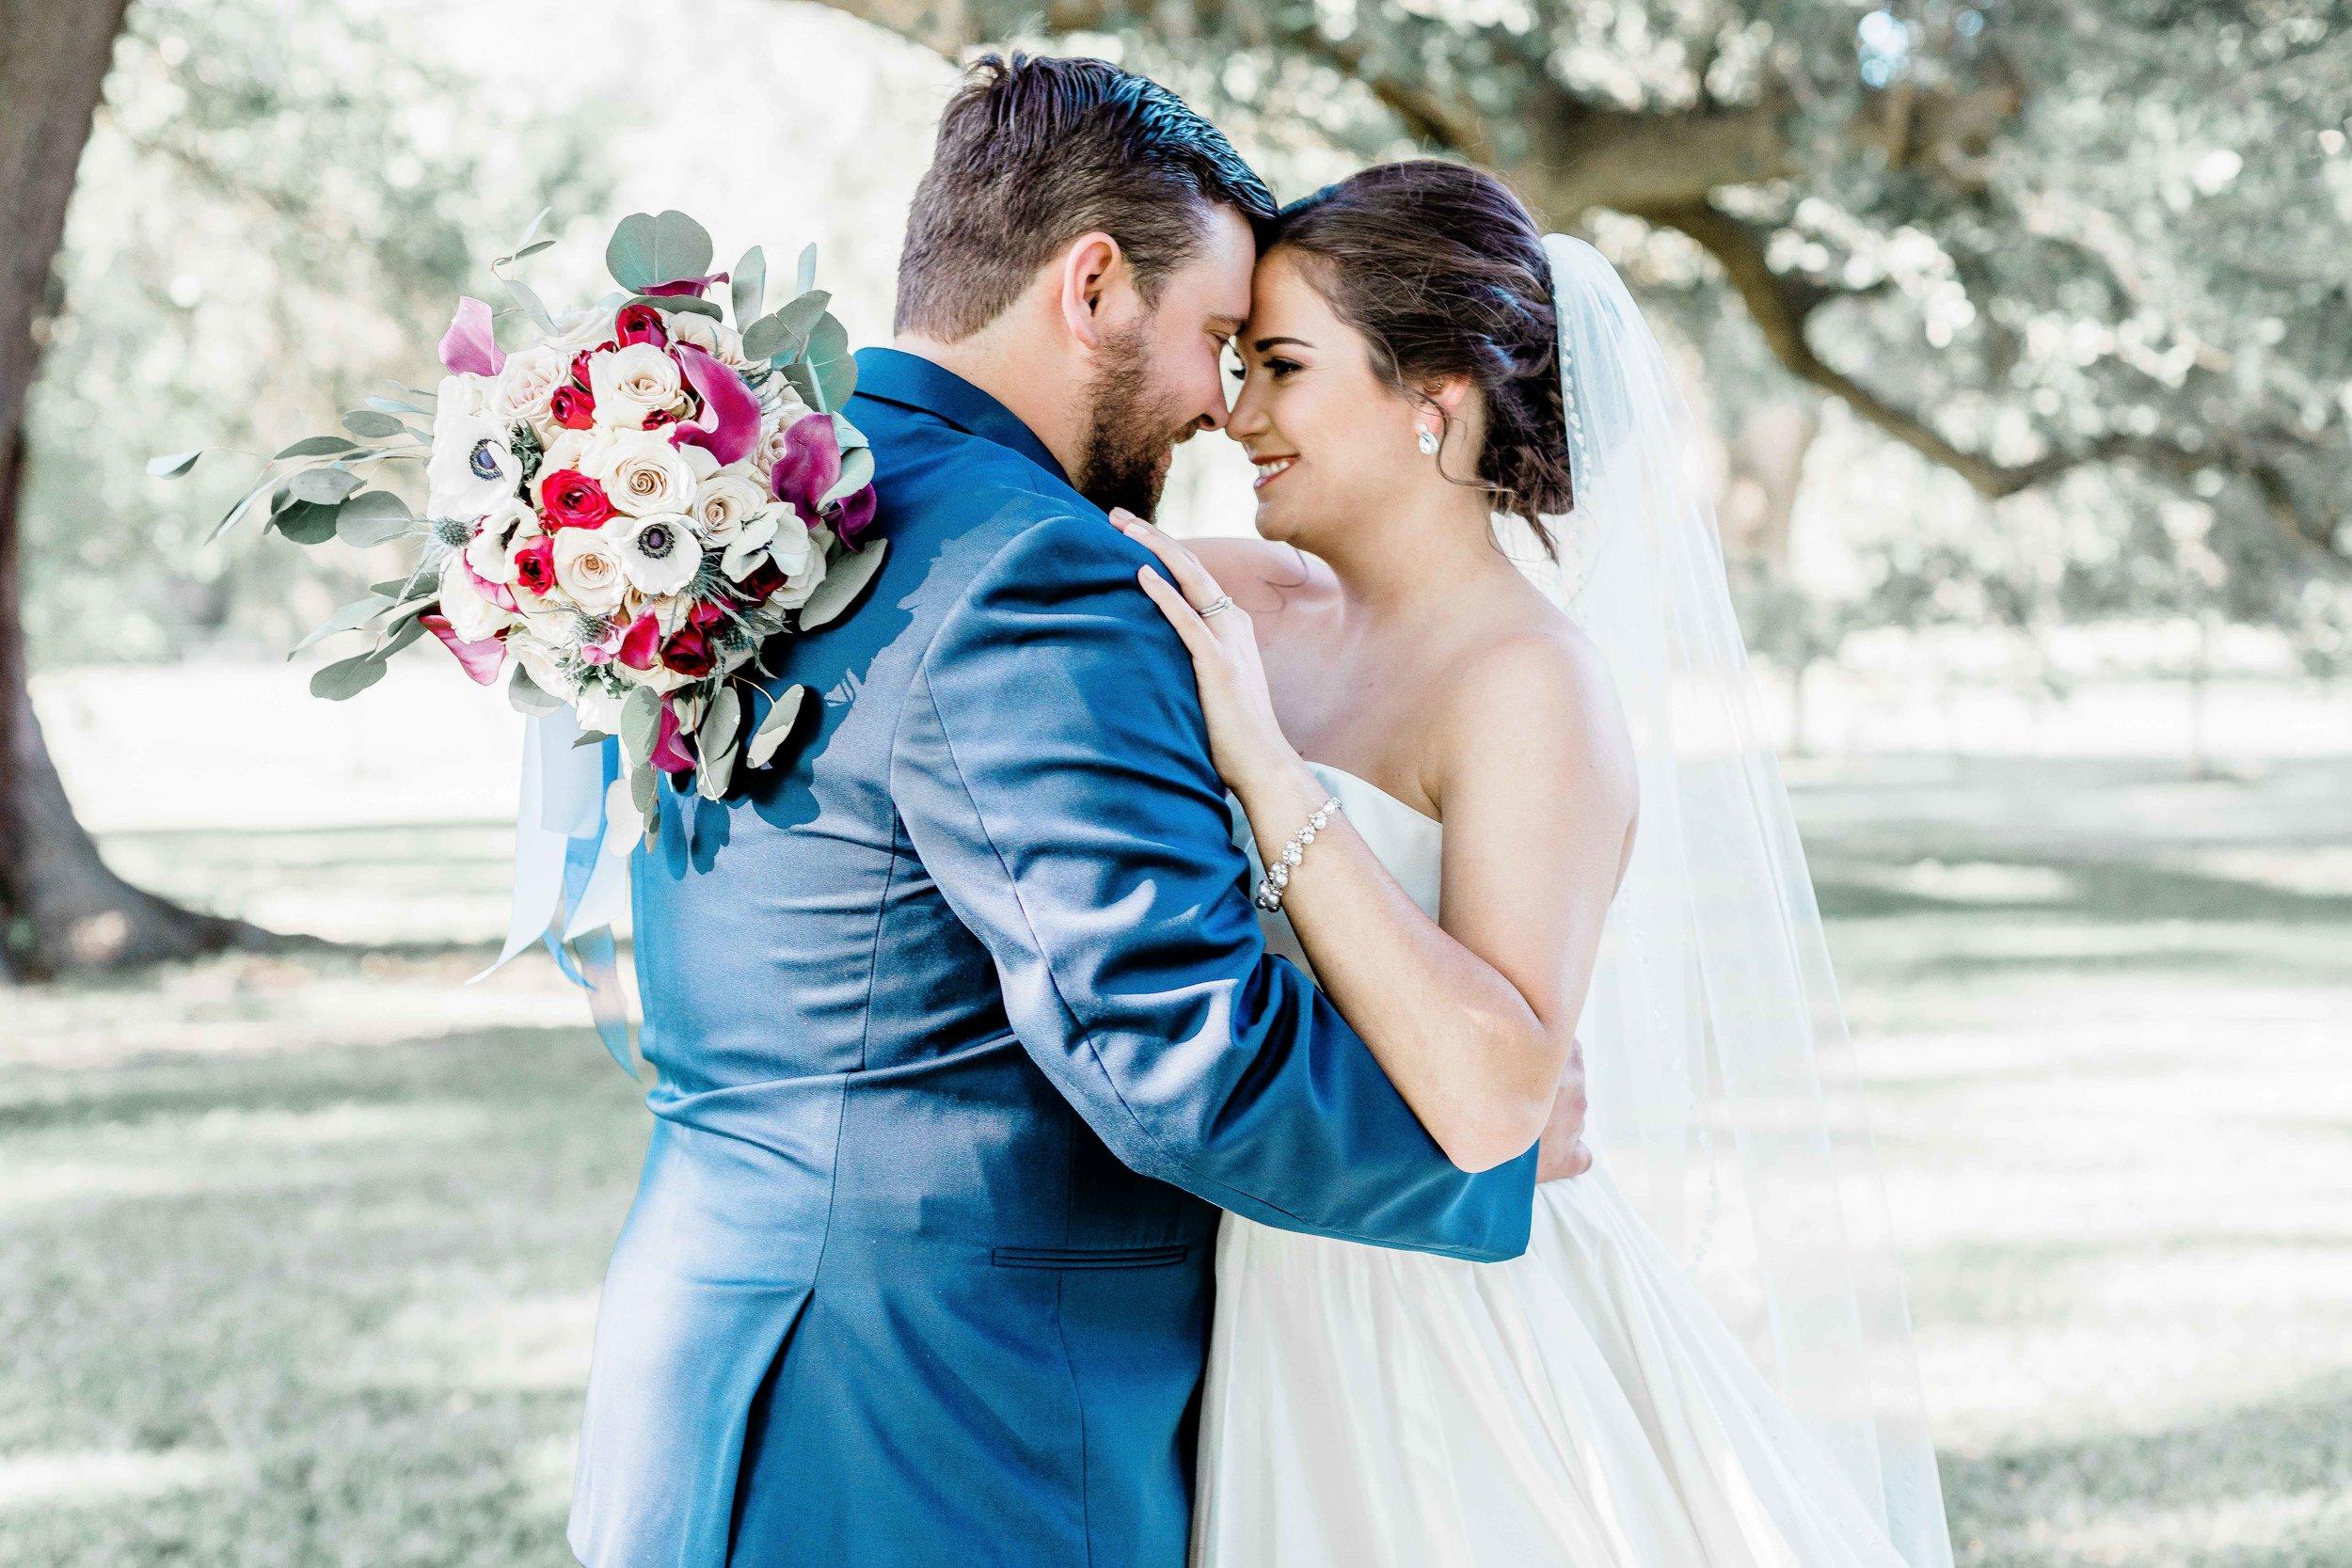 20190427-Southern Lens Photography- Savannah Wedding Photographer-Screven and Caroline-201975.jpg